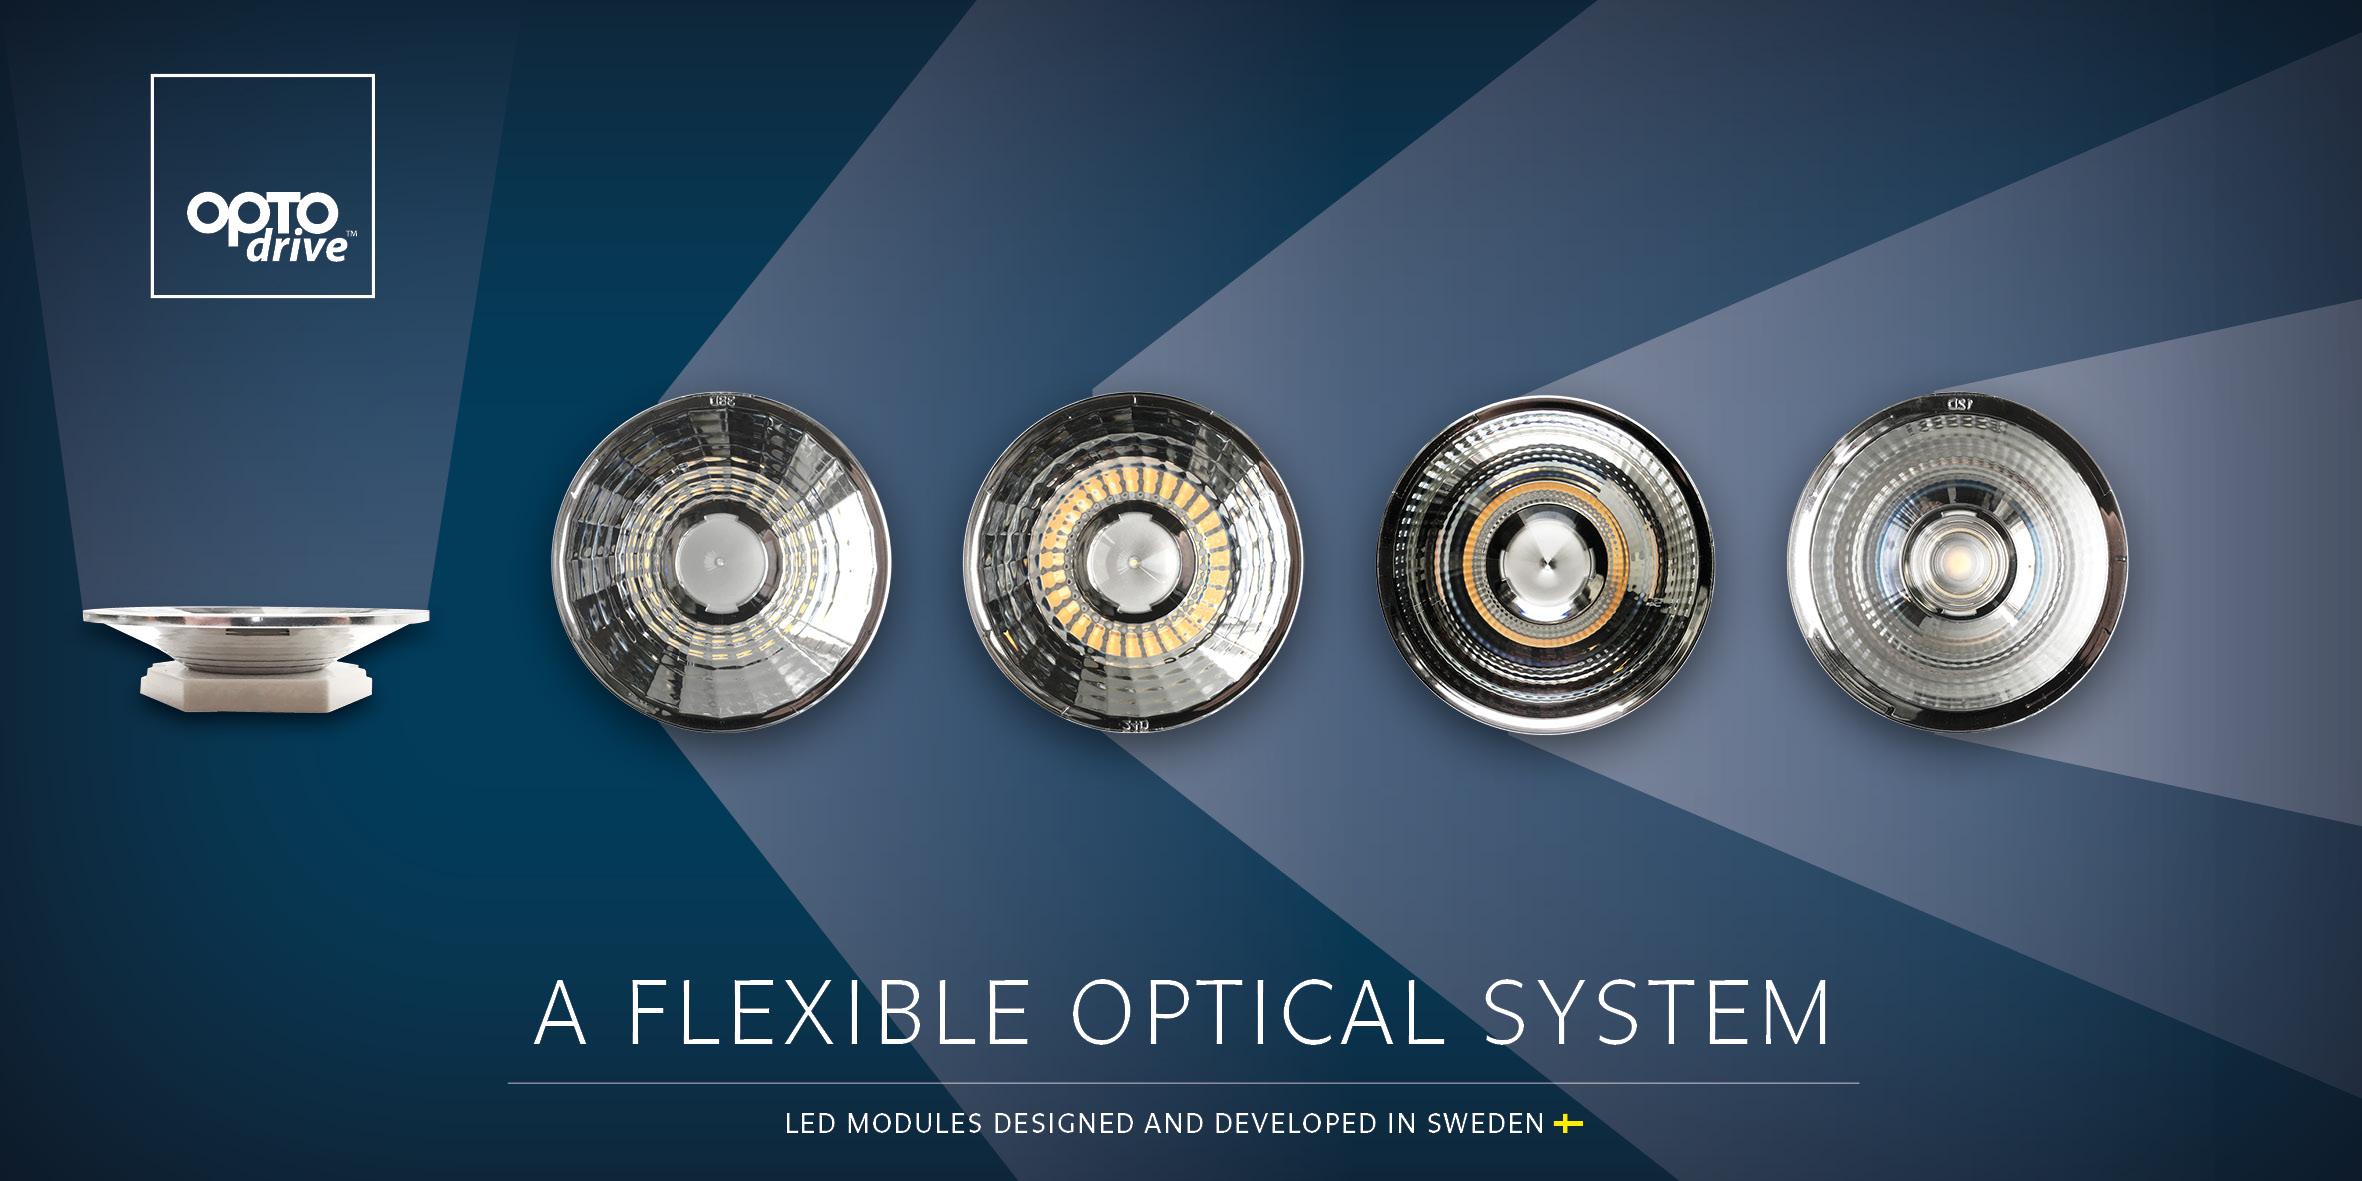 A flexible optical system